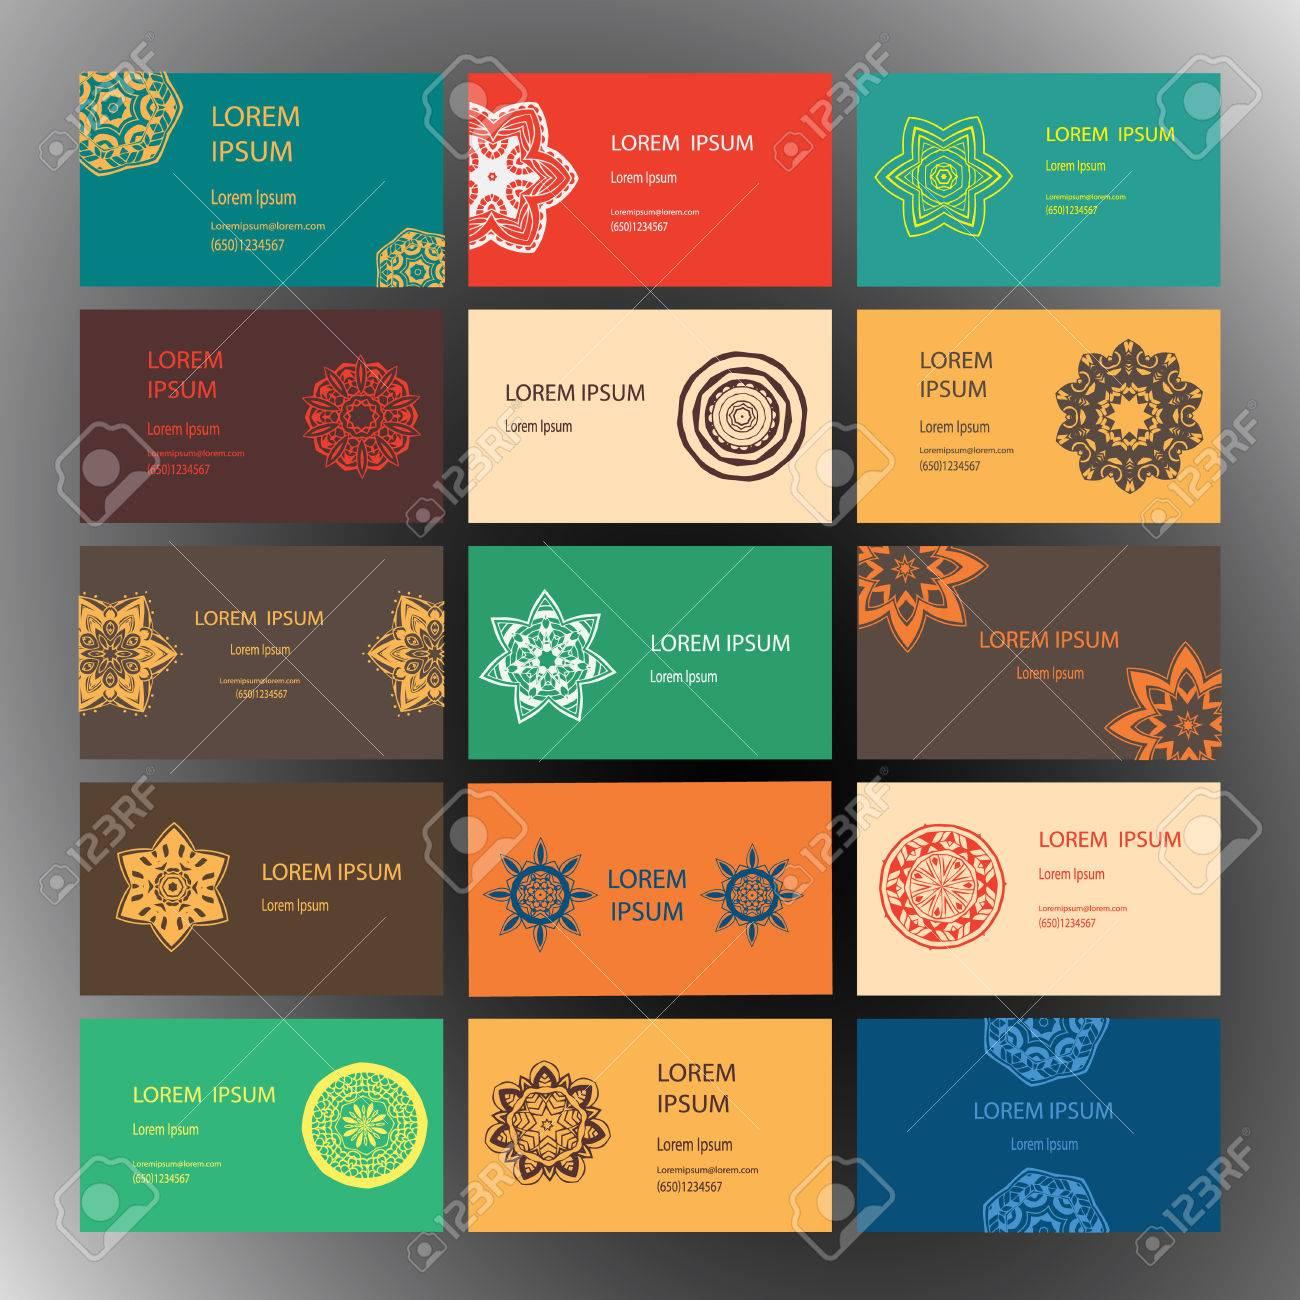 Einladung Zum Islam – thegirlsroom.co